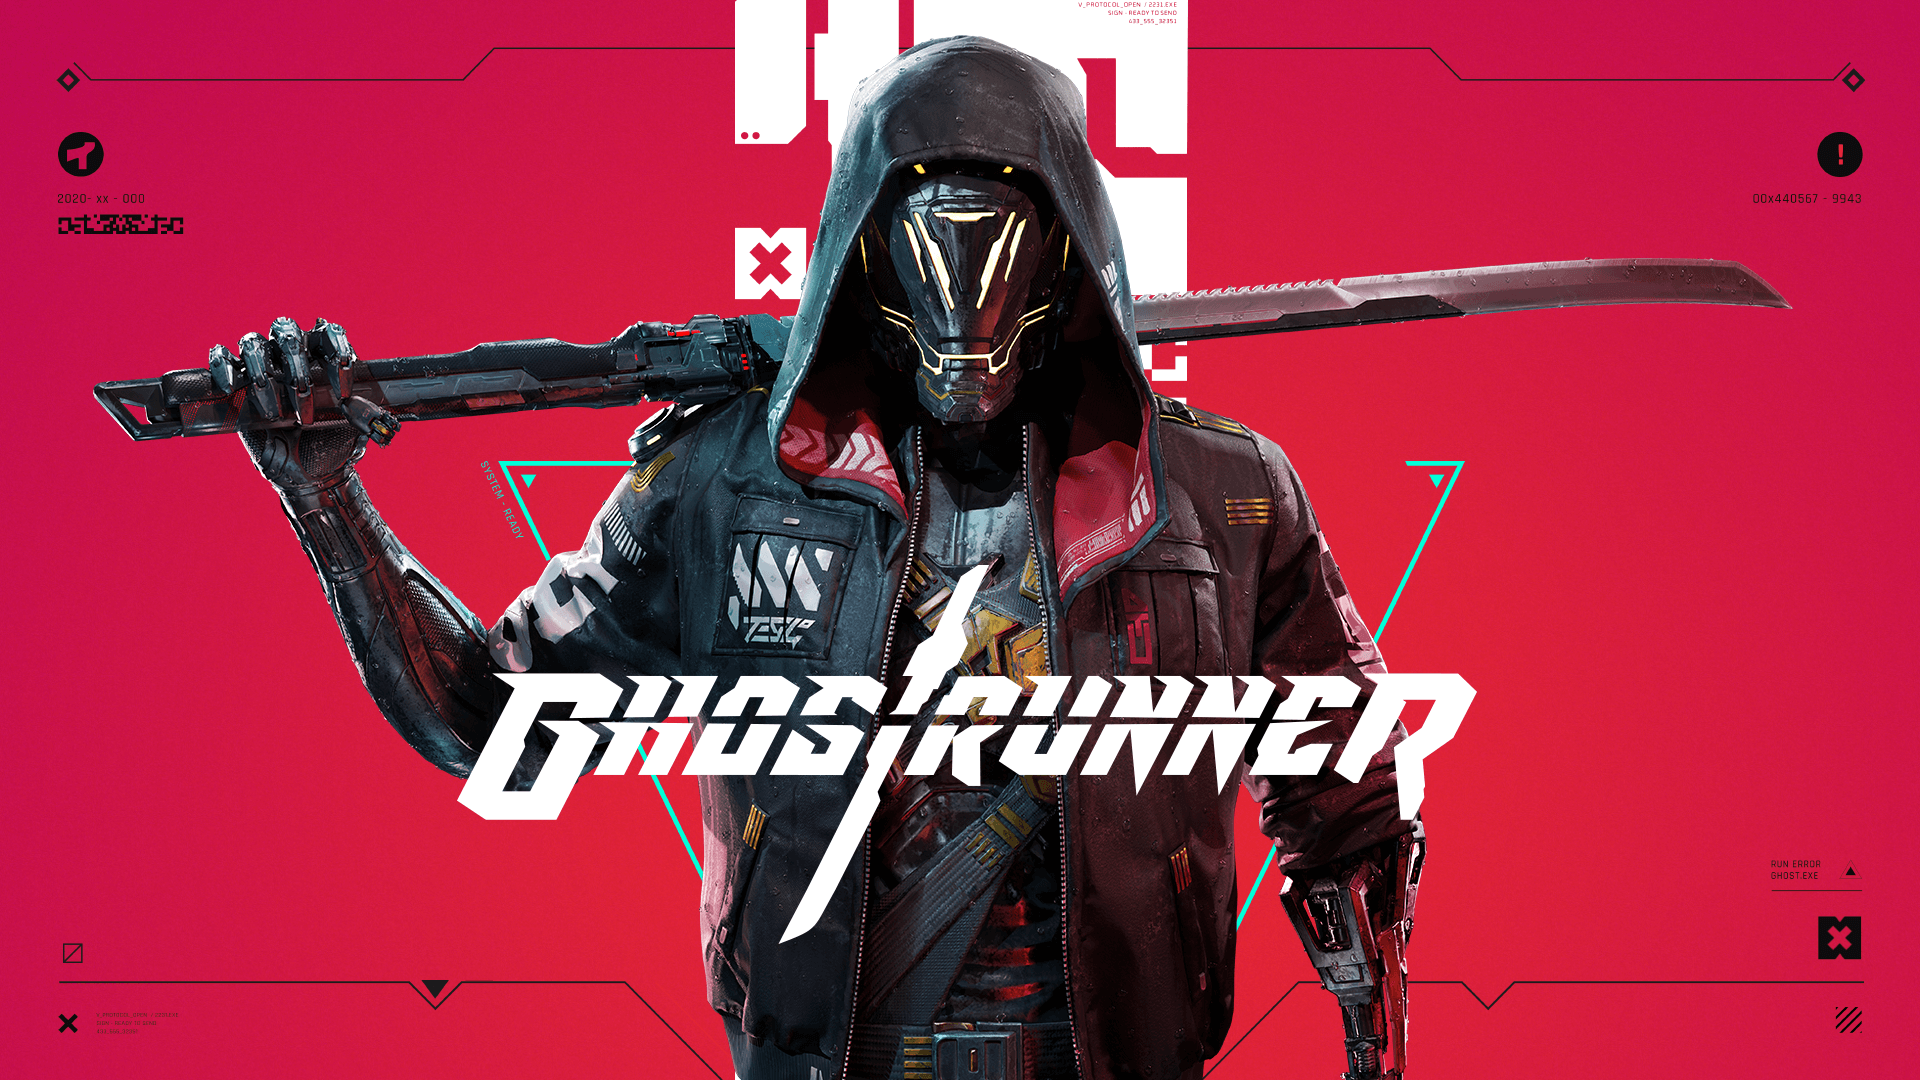 Ghostrunner w1 - سی دی کی اورجینال Ghostrunner